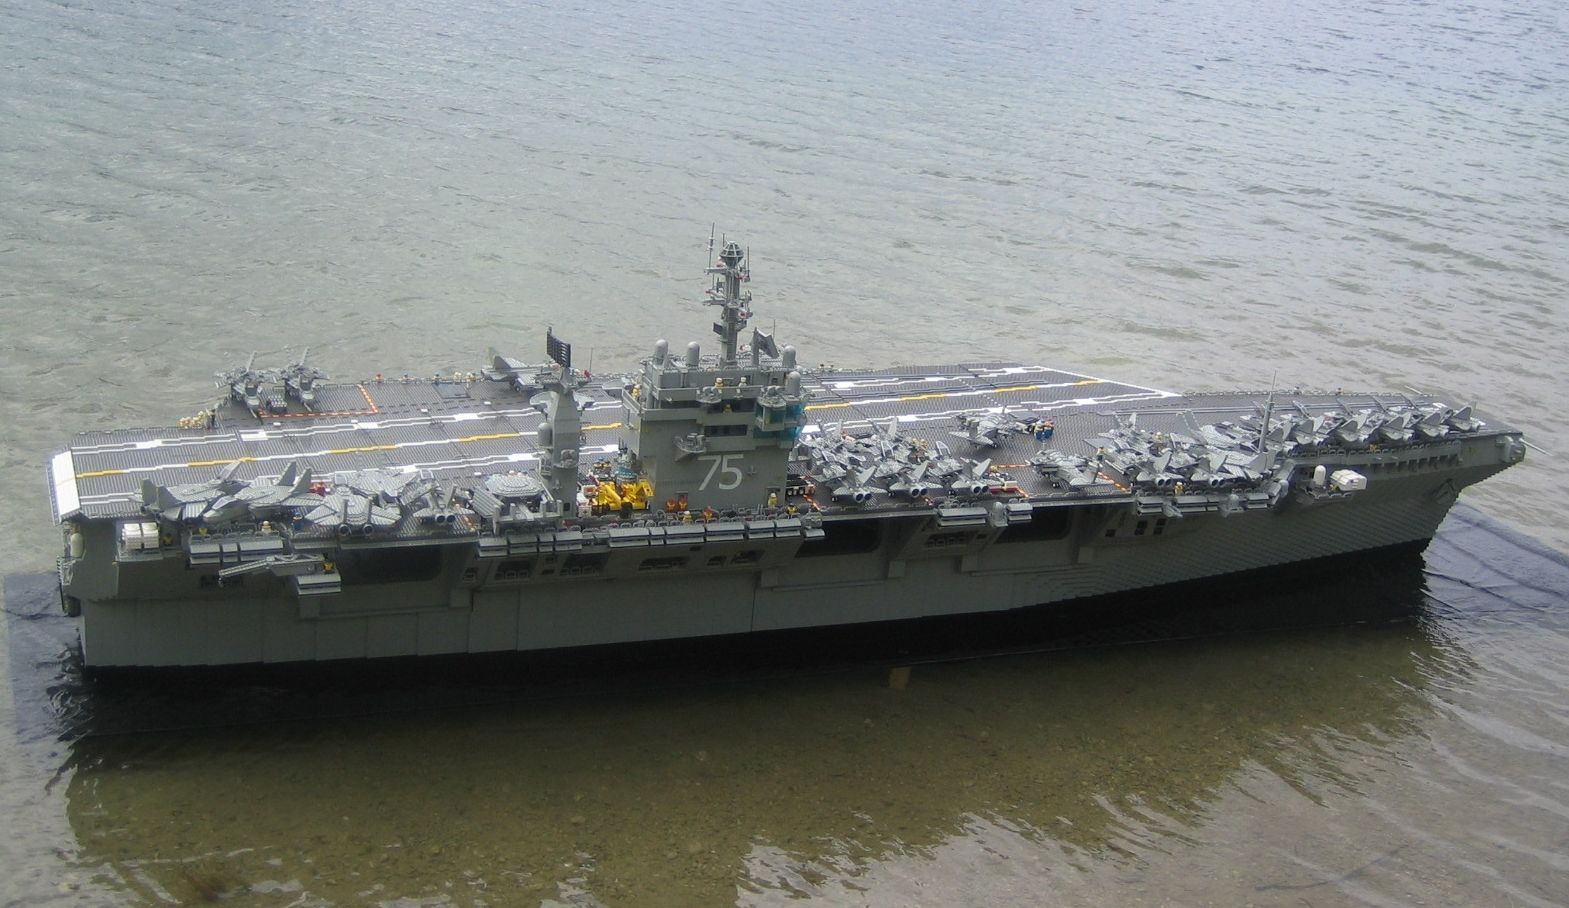 LEGO Harry S. Truman aircraft carrier